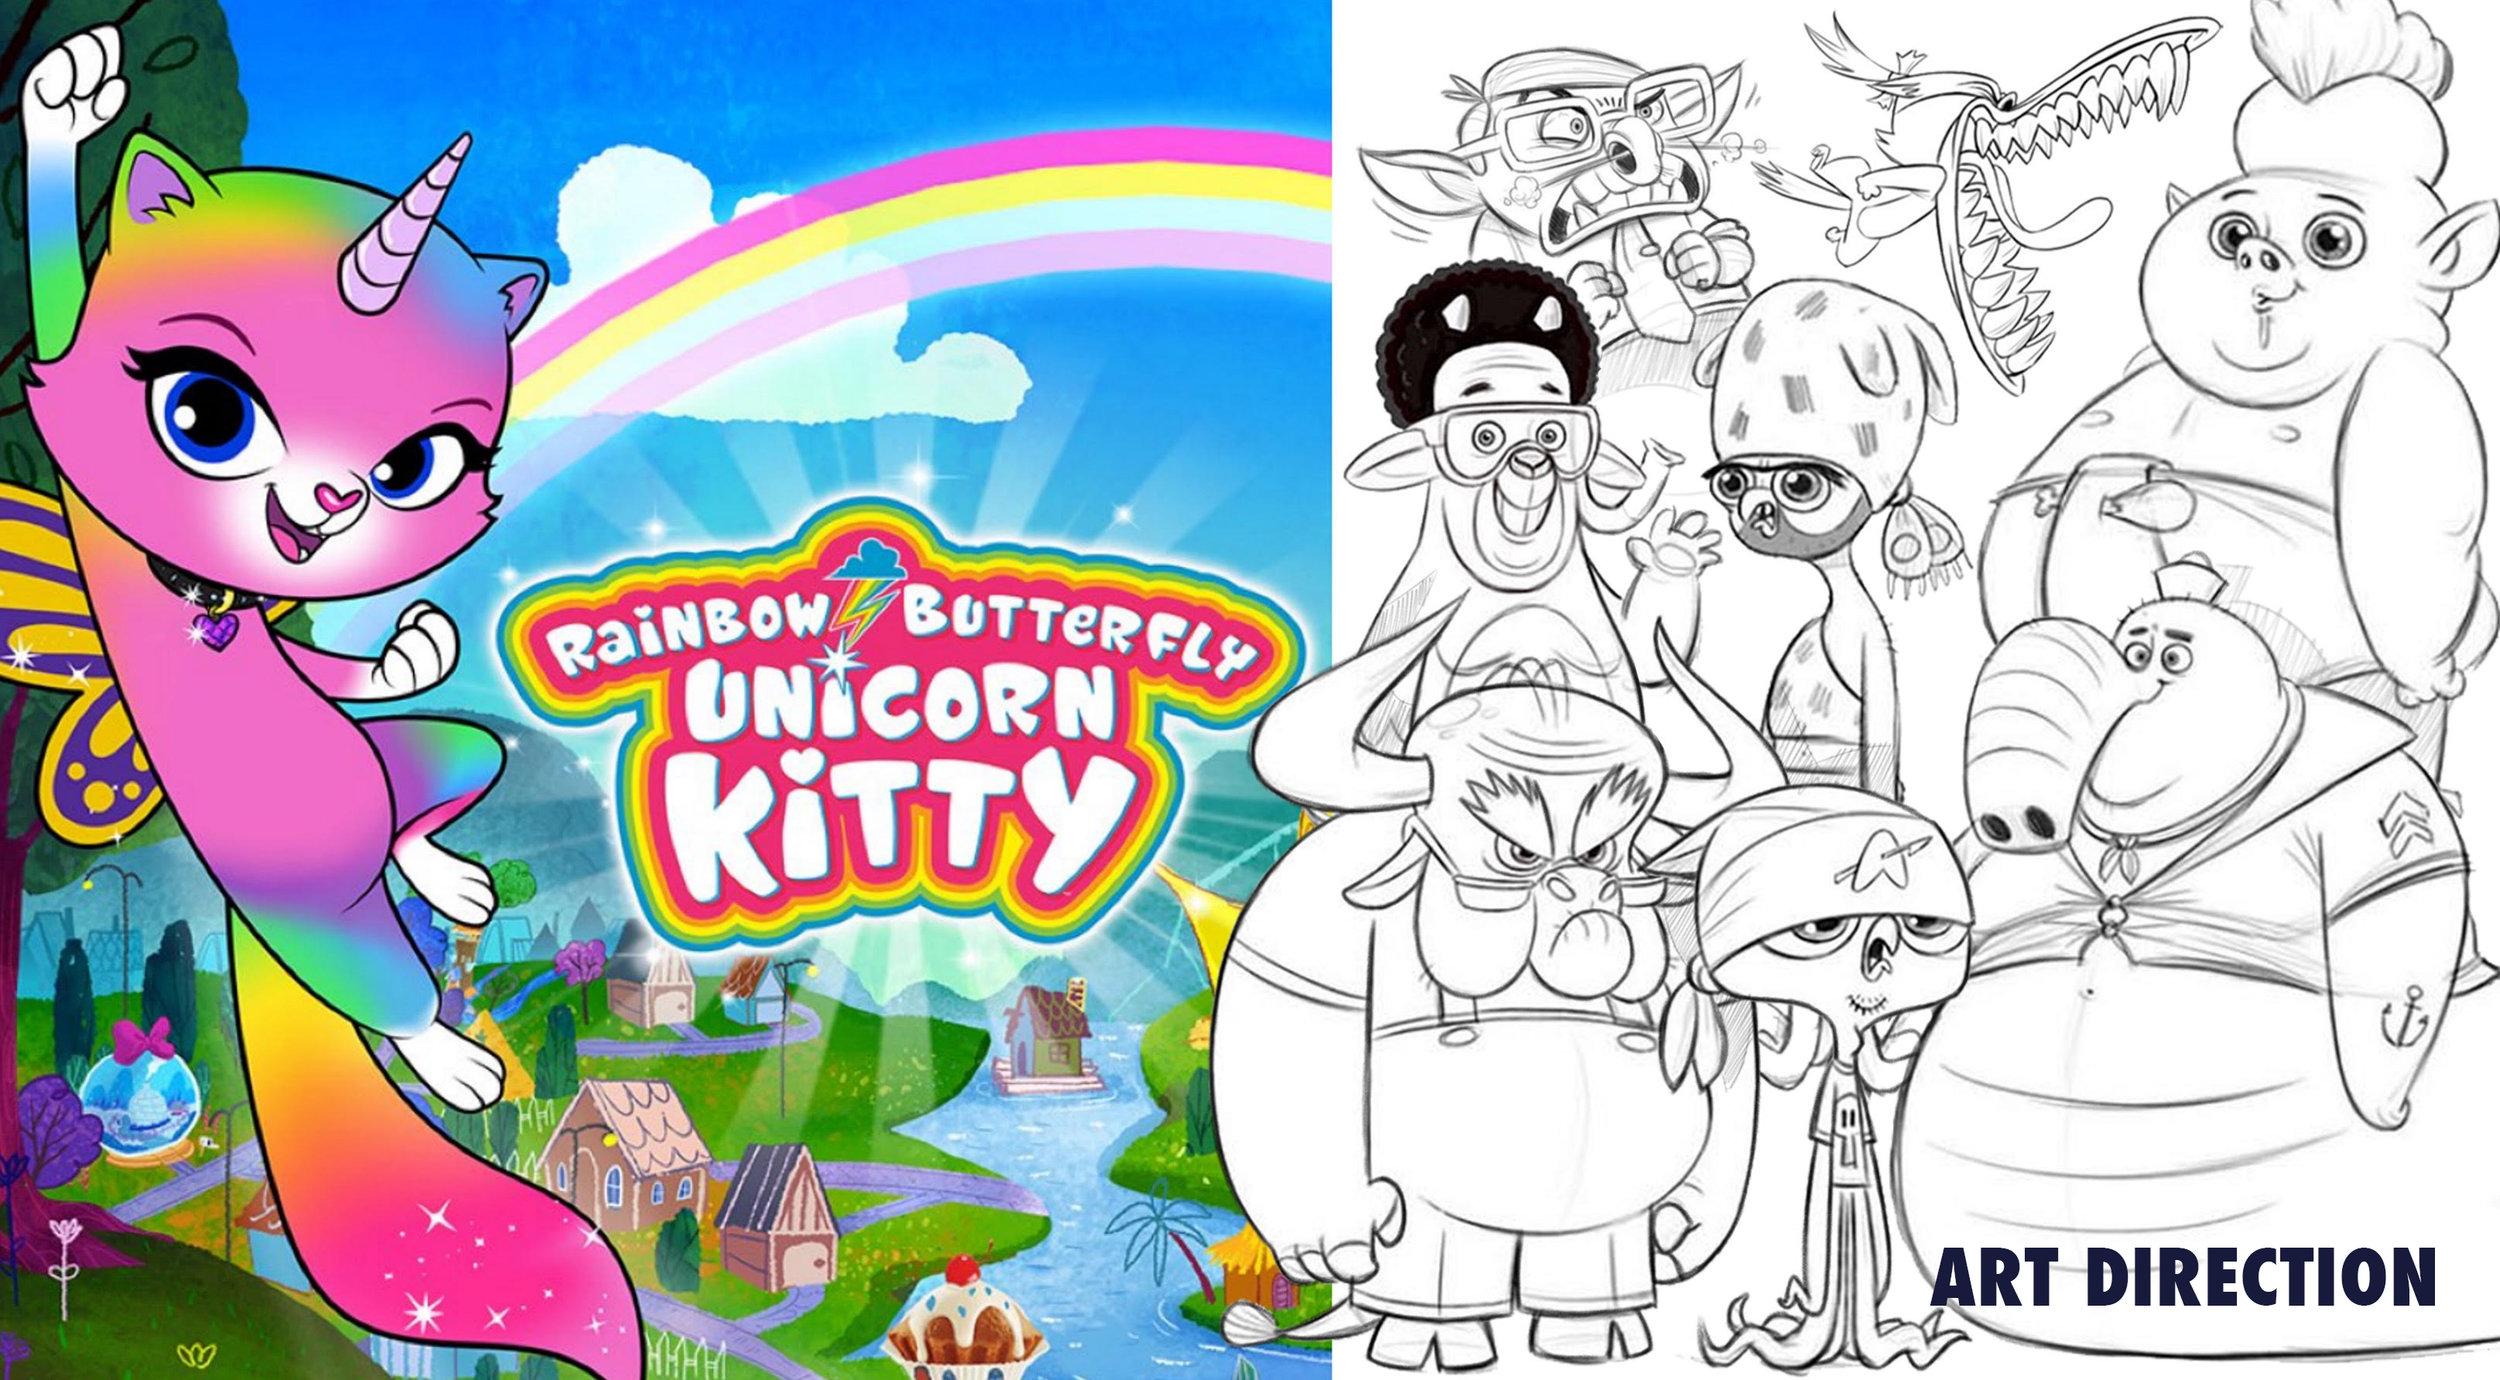 RainbowButterflyUnicornKitty.jpg